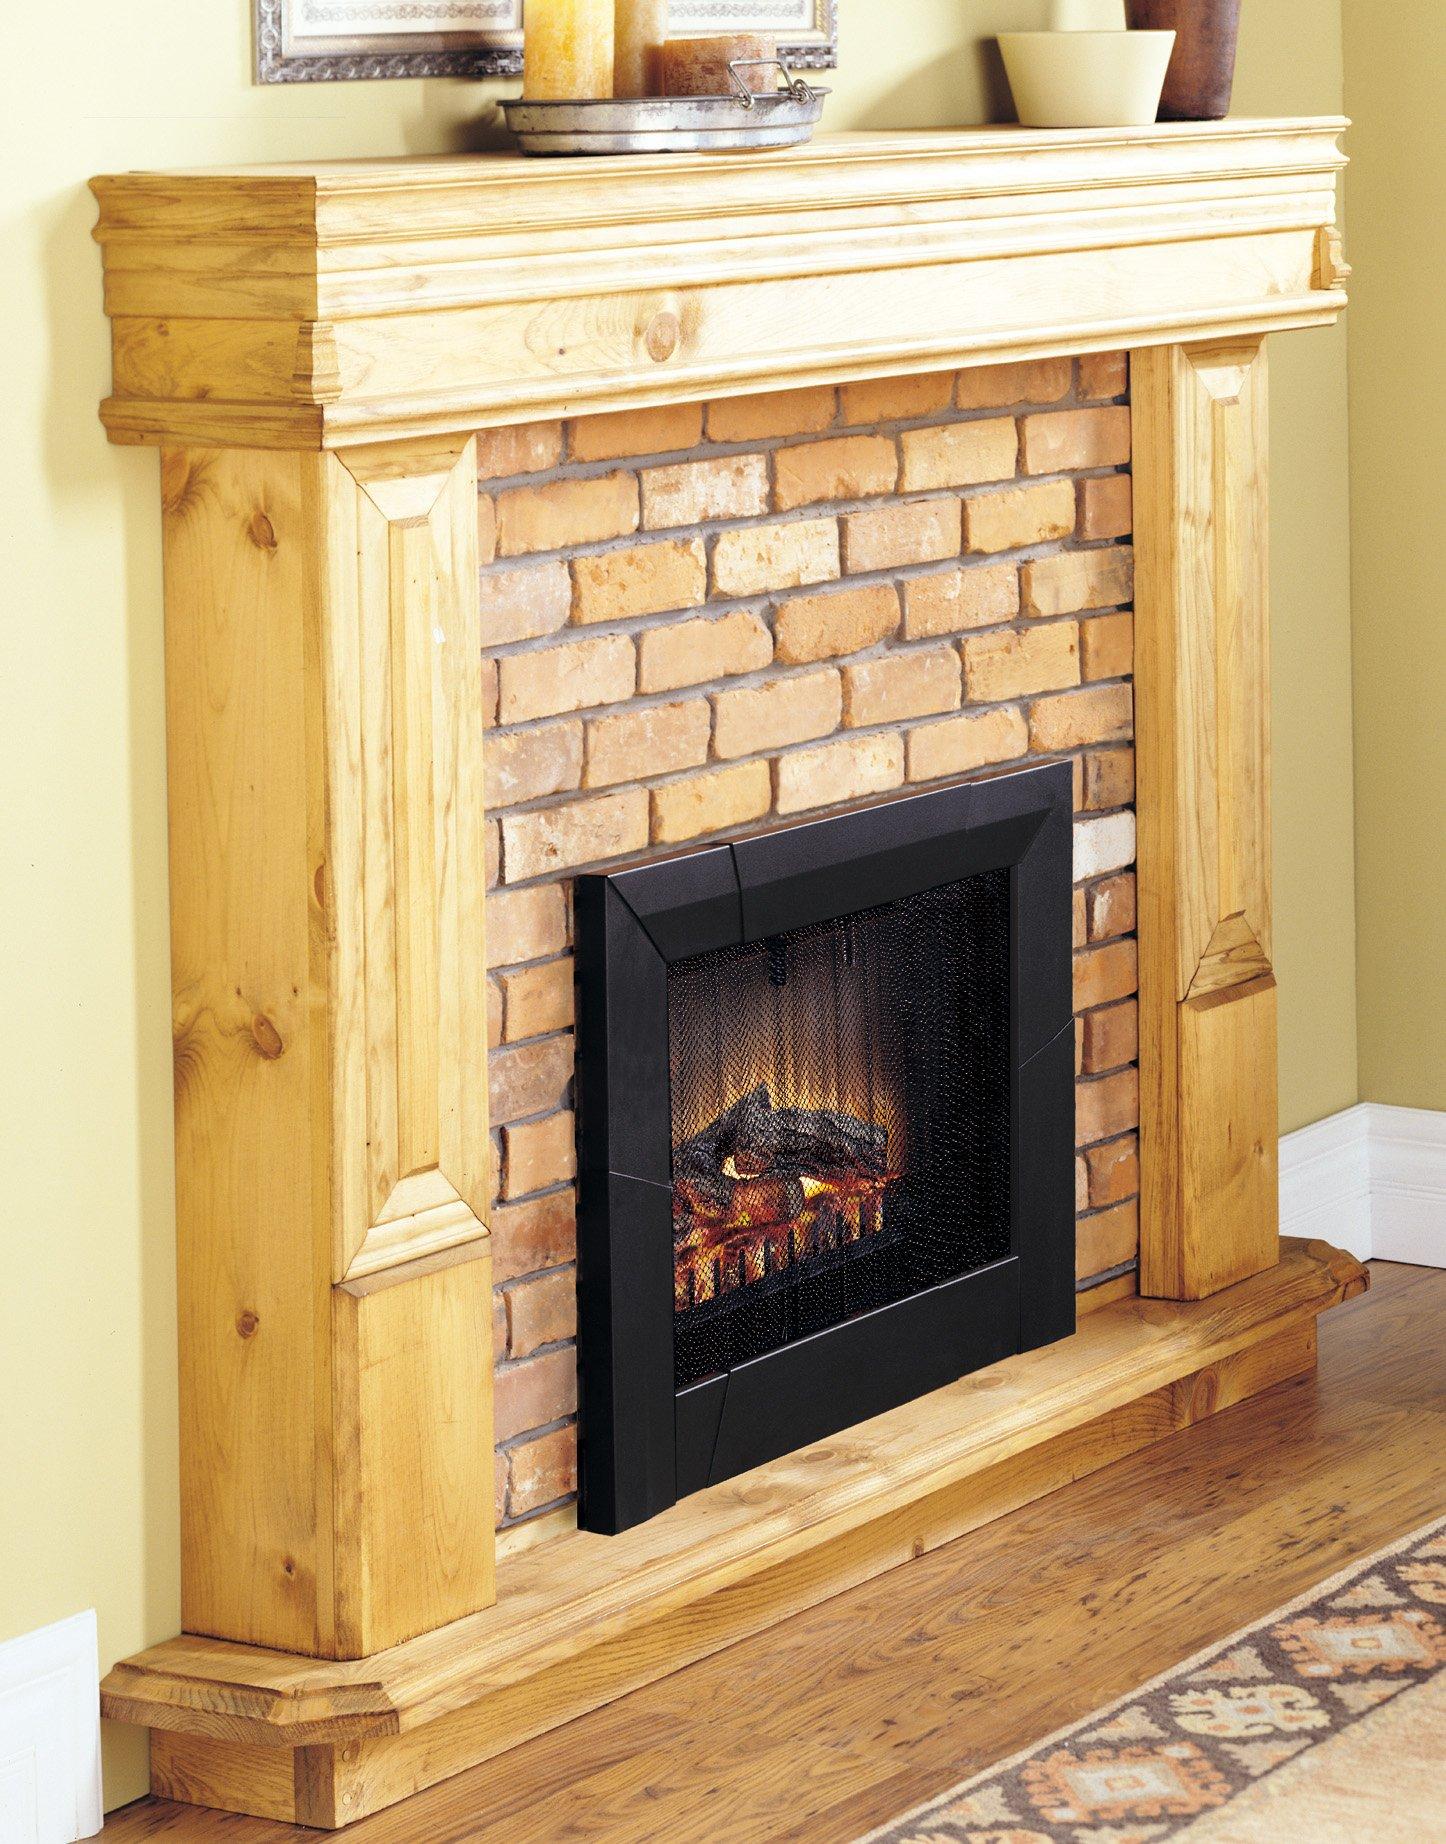 Dimplex DFI23TRIMX Expandable Trim Kit for Electric Fireplace Insert